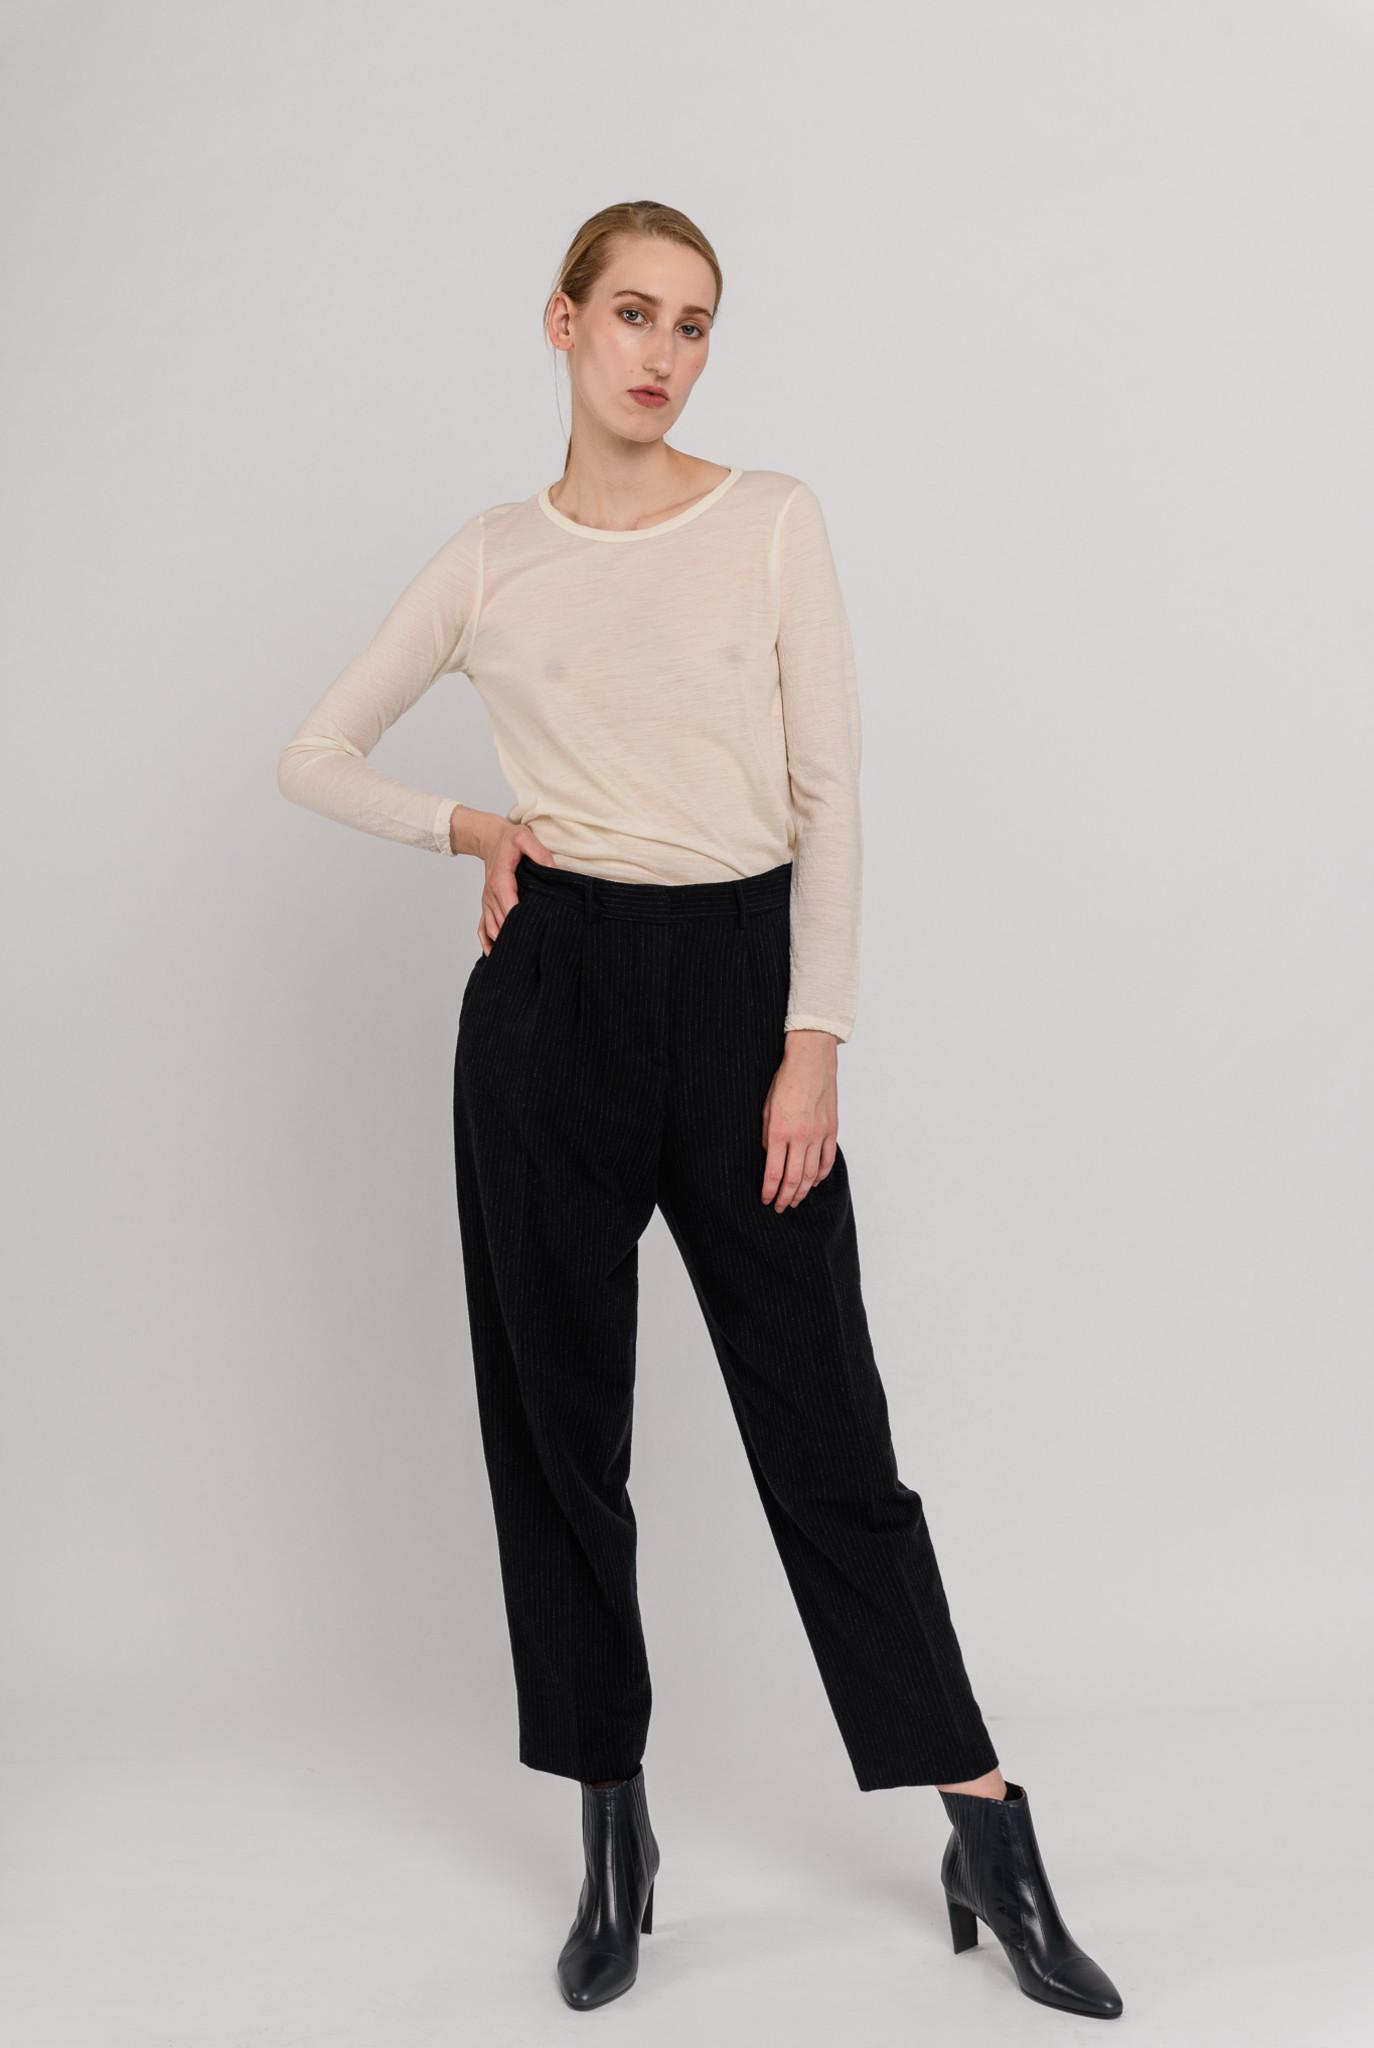 Longsleeve t-shirt creme wool